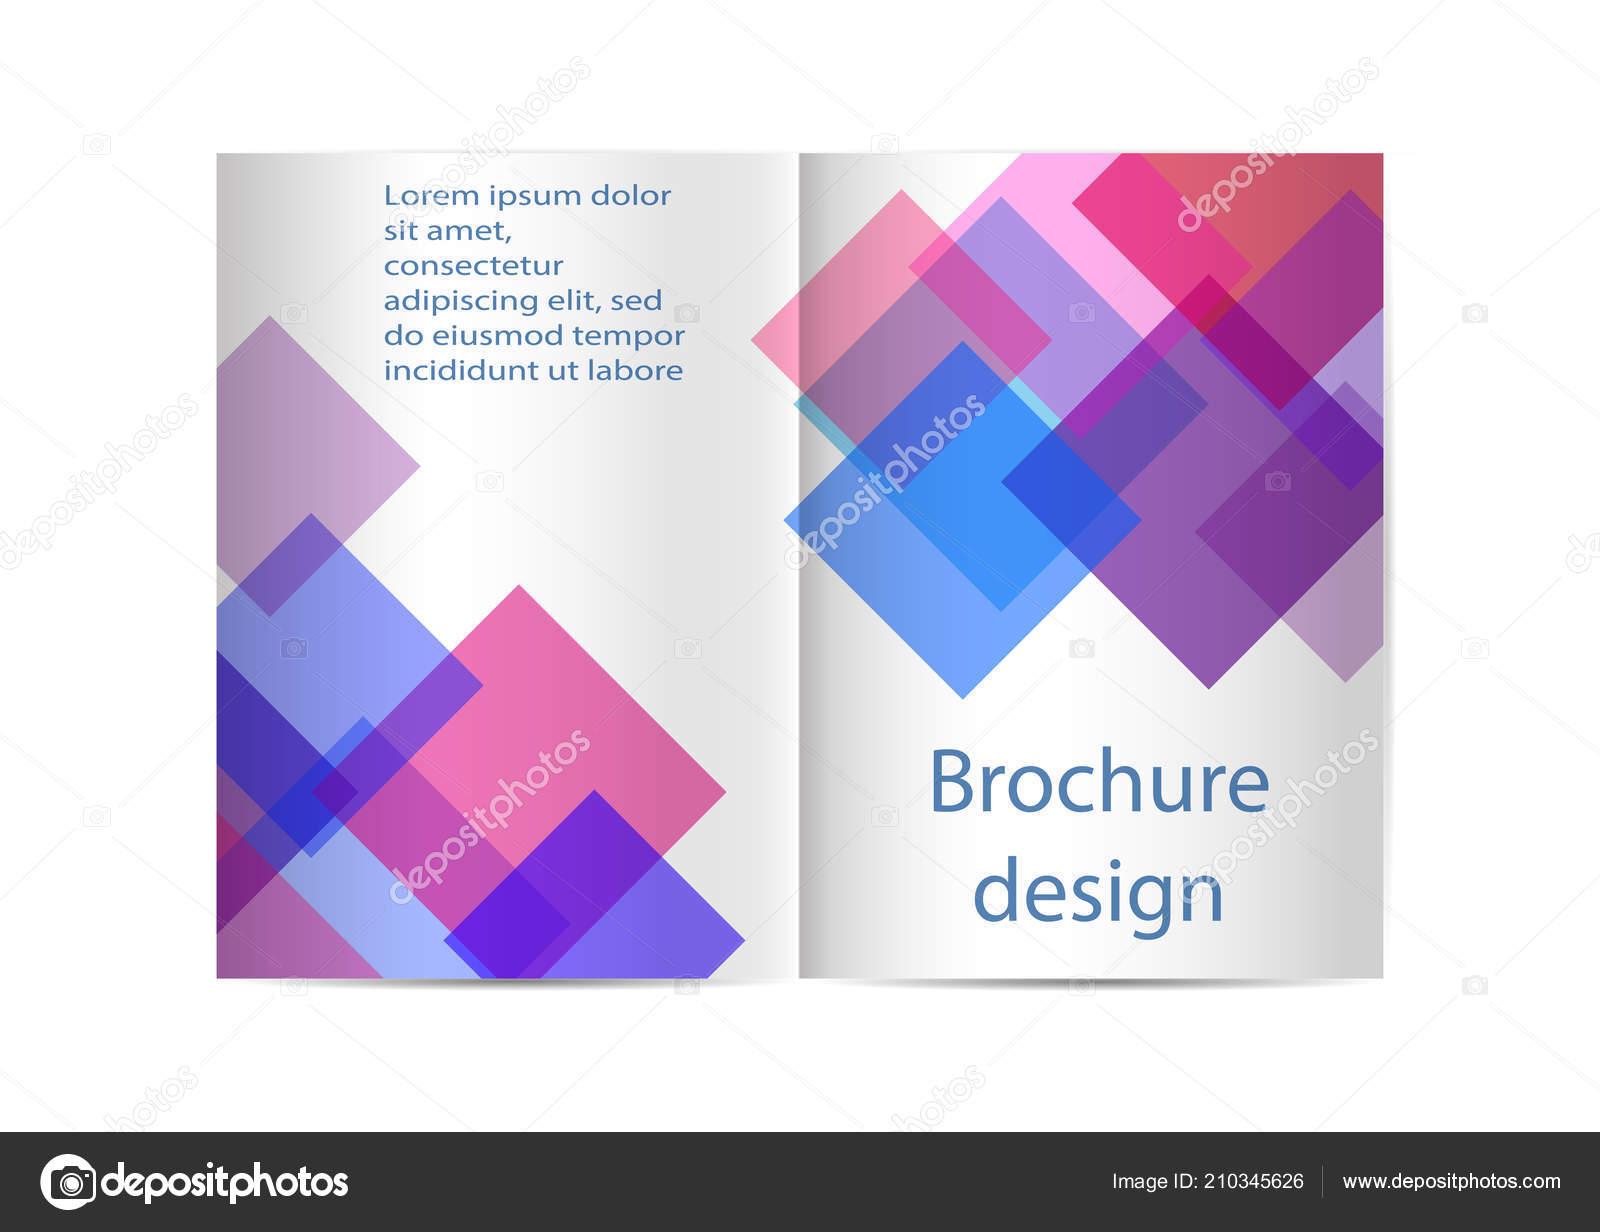 brochure template flyer design depliant cover business presentation